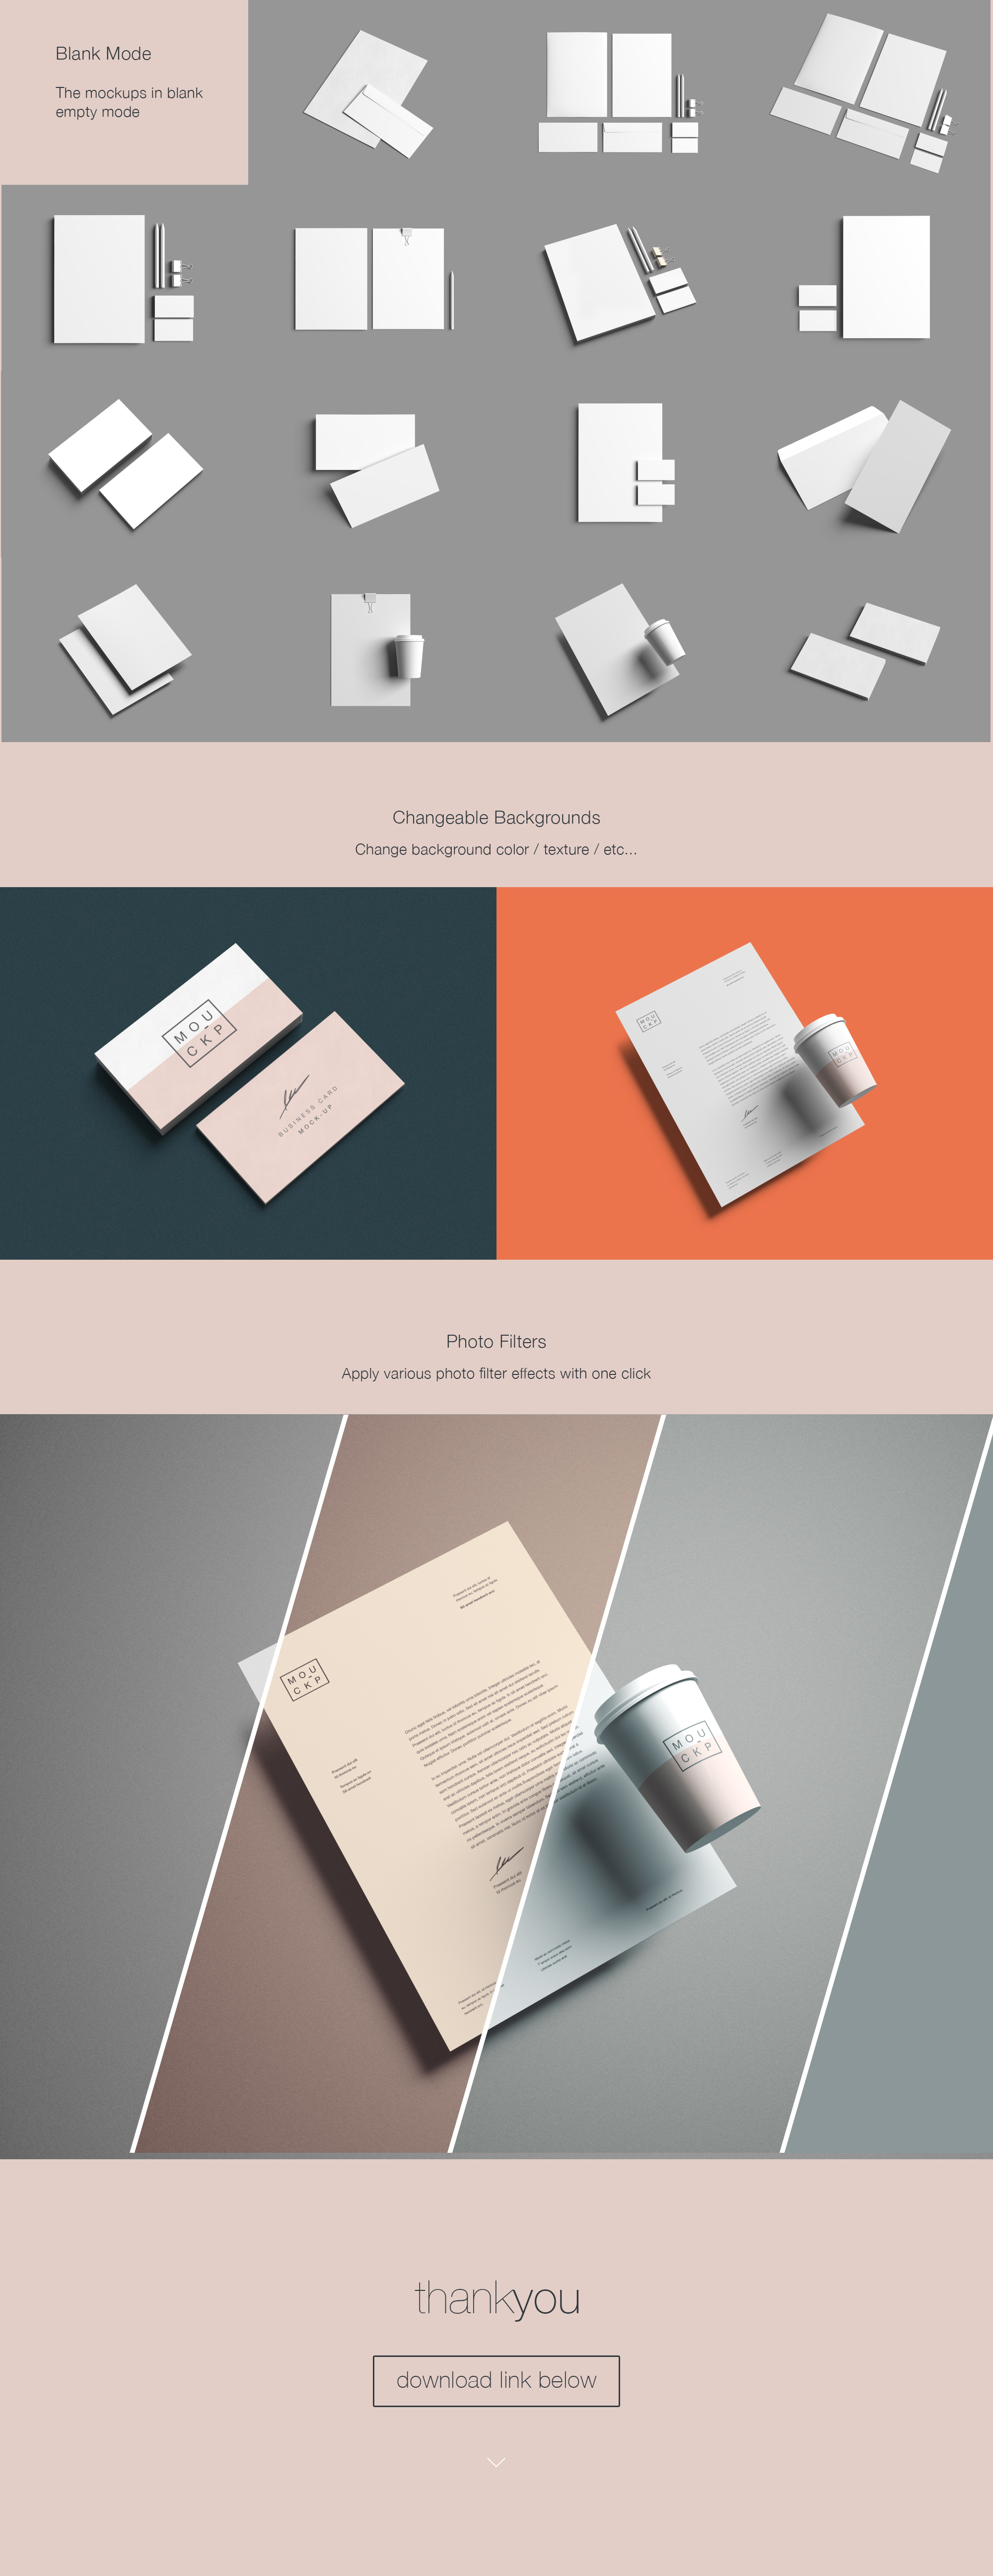 Advanced Branding Stationery Mockup on Behance